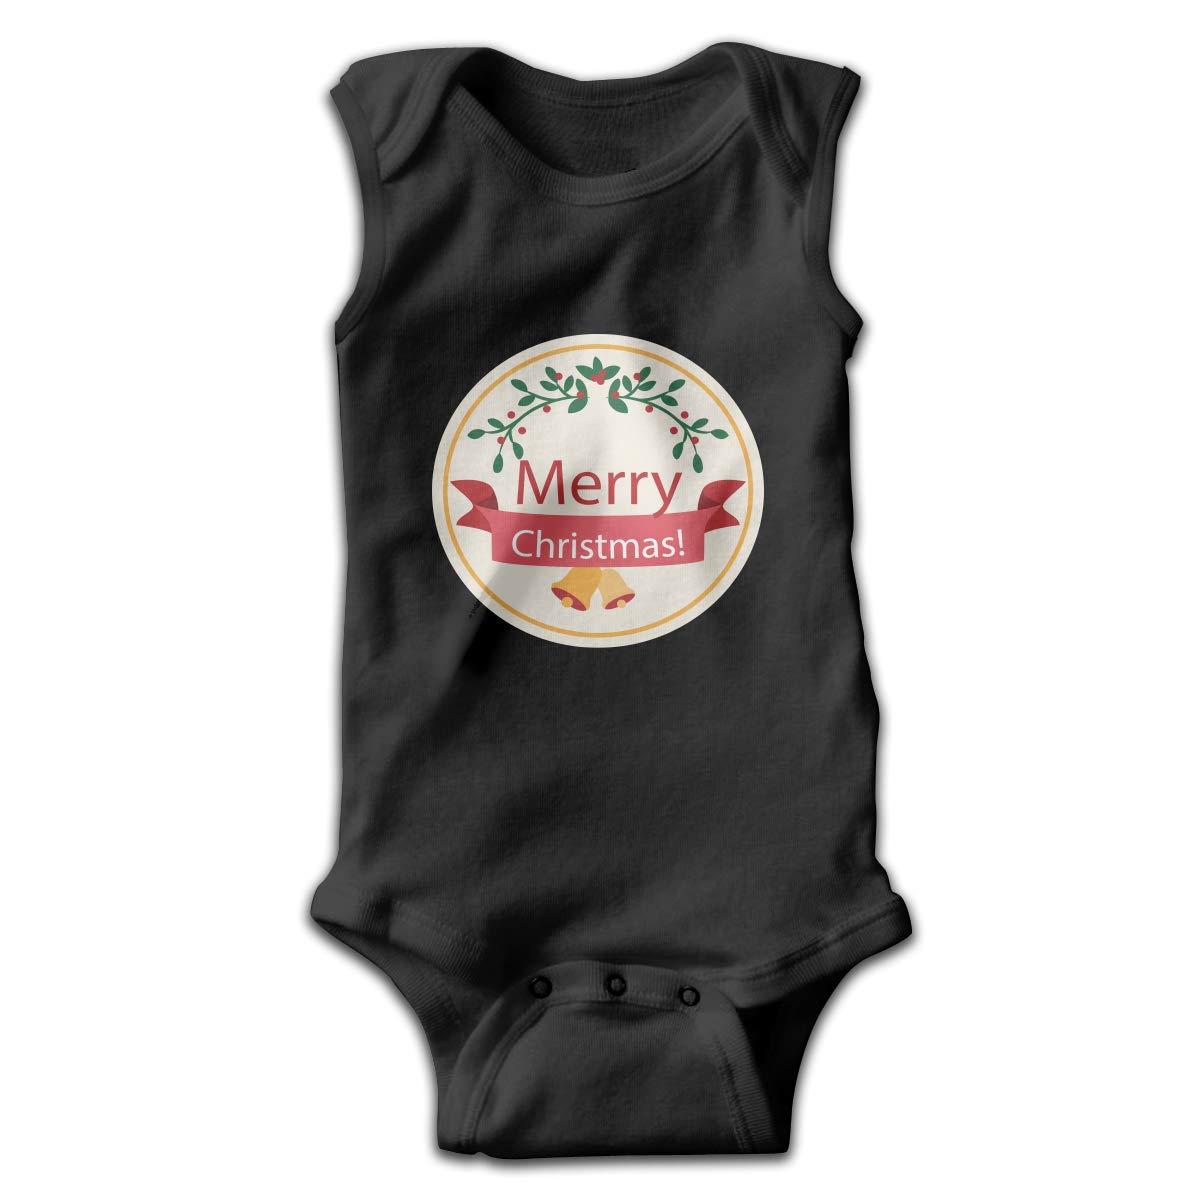 Efbj Newborn Baby Girls Rompers Sleeveless Cotton Onesie,Merry Christmas Circle Bodysuit Spring Pajamas